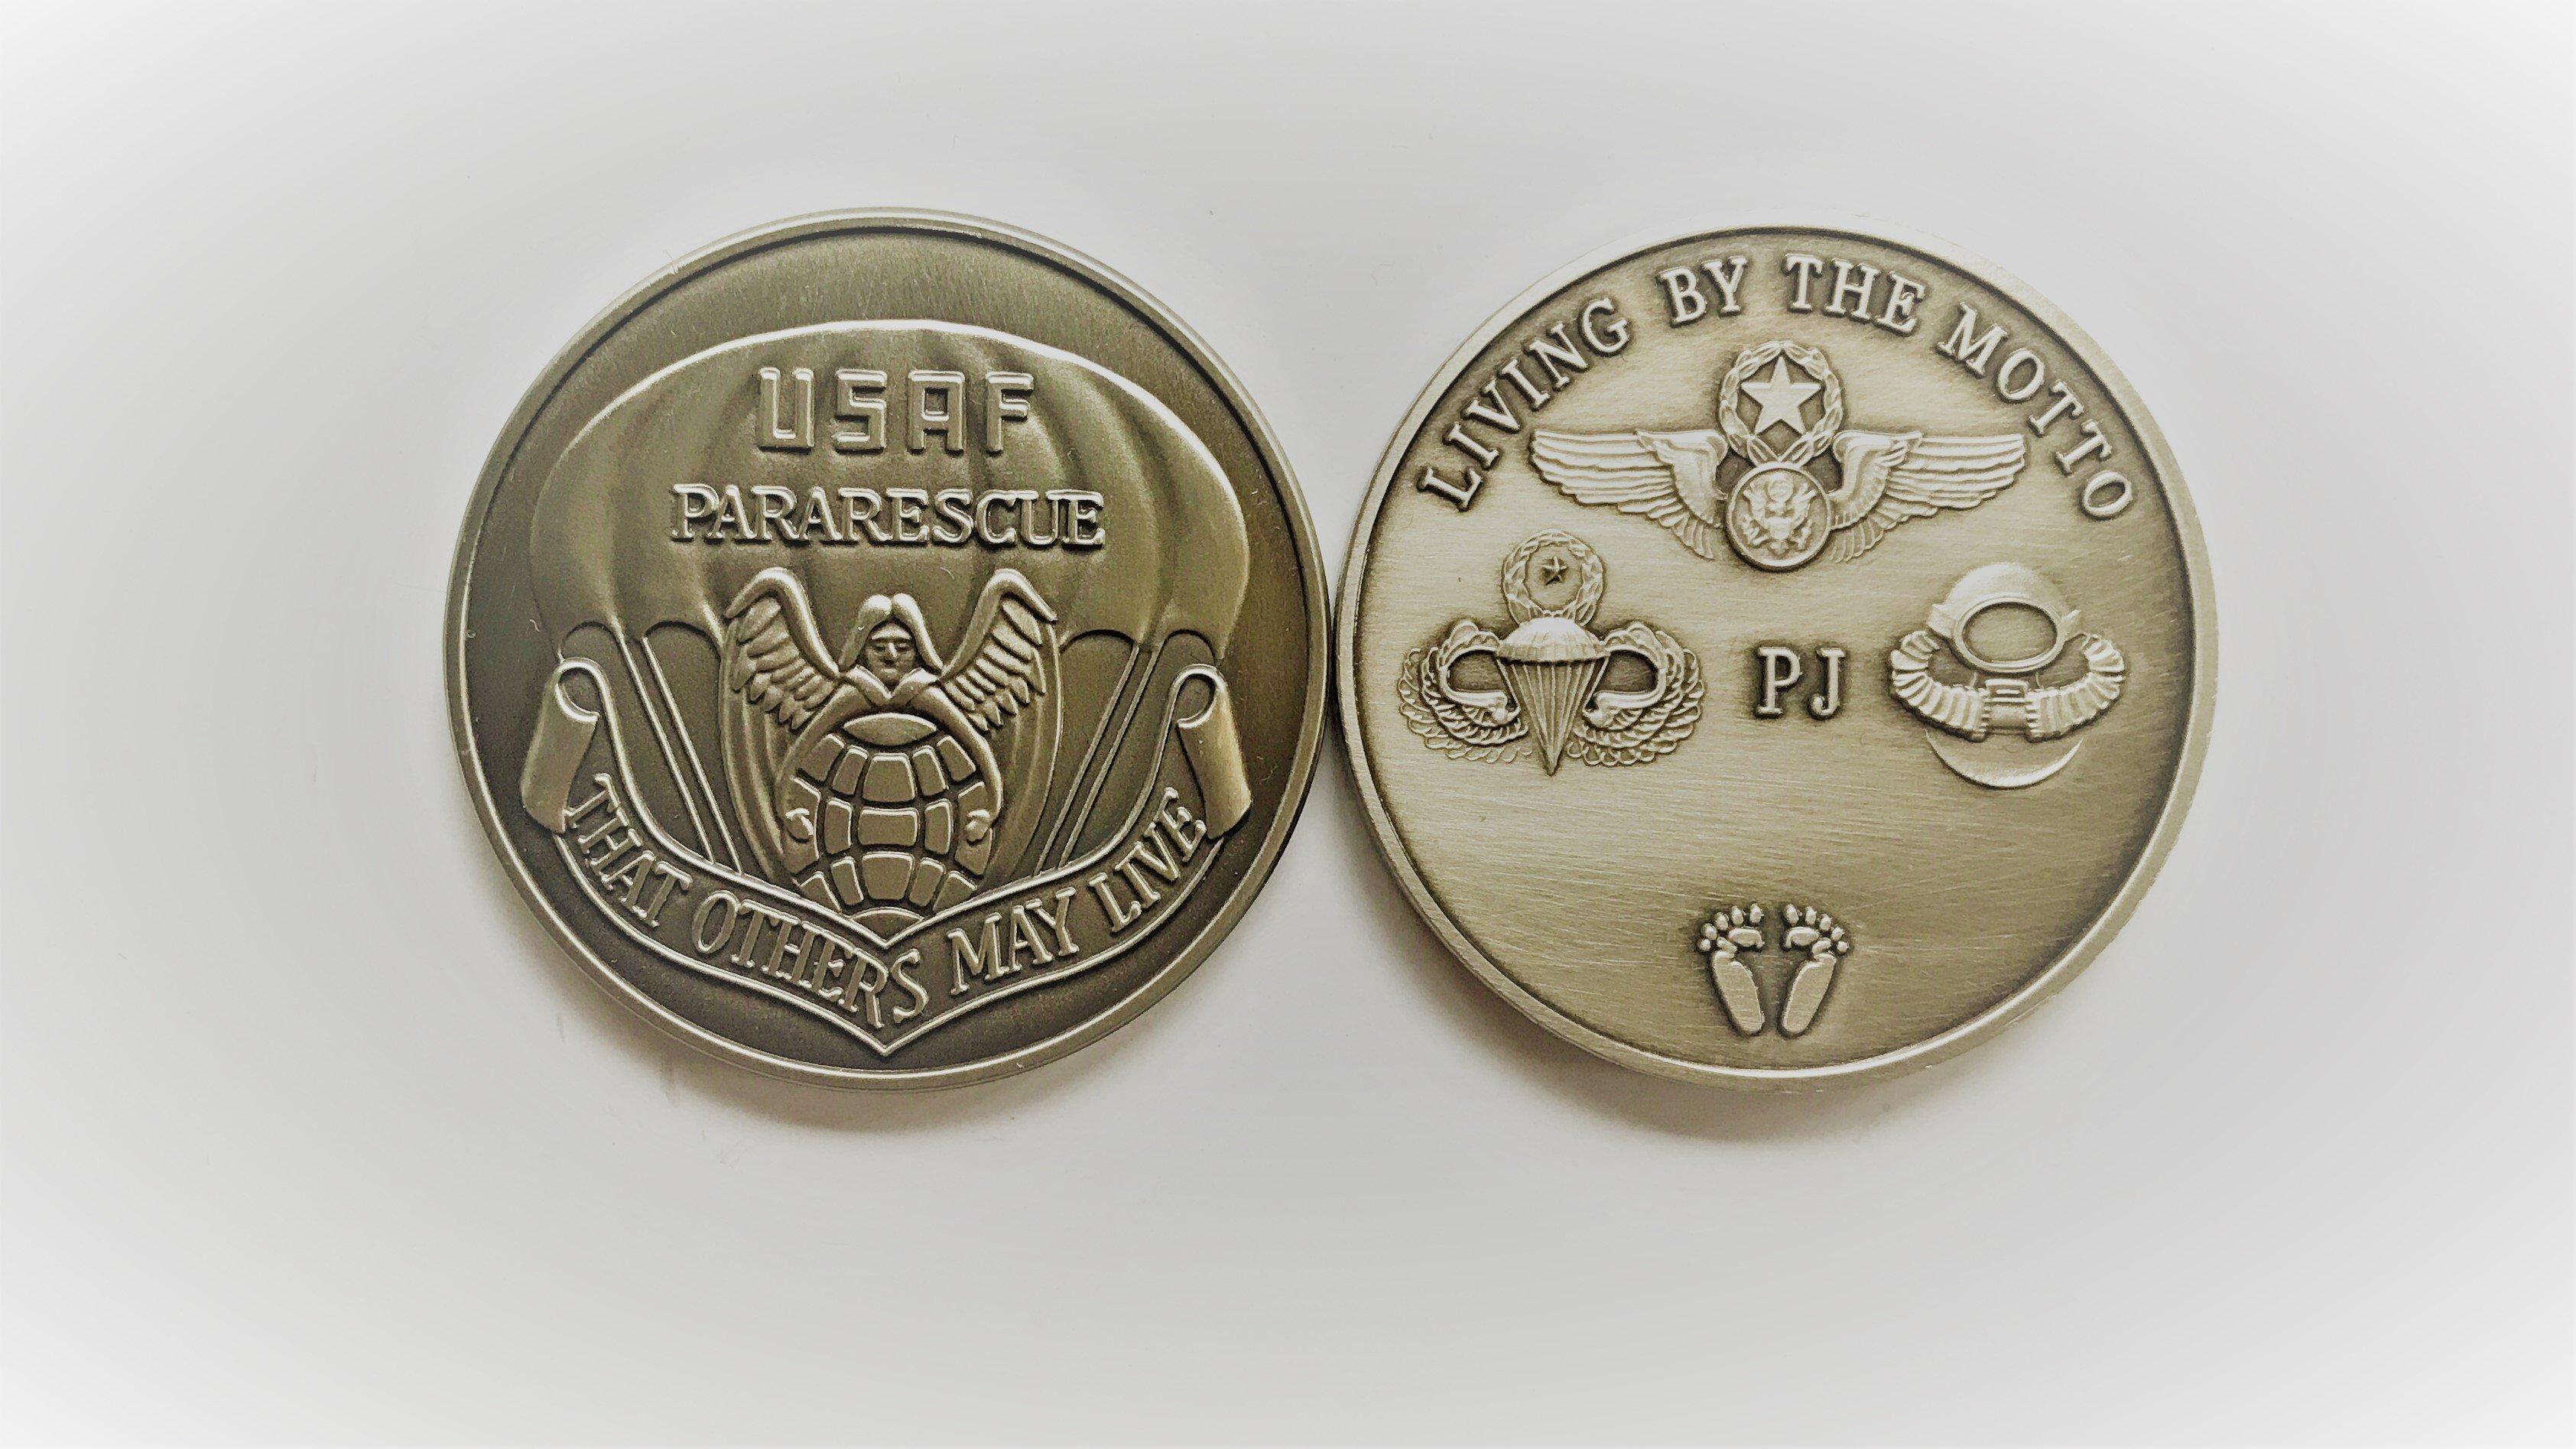 pja/ PJ Challenge Coin - Peweter 01-0029